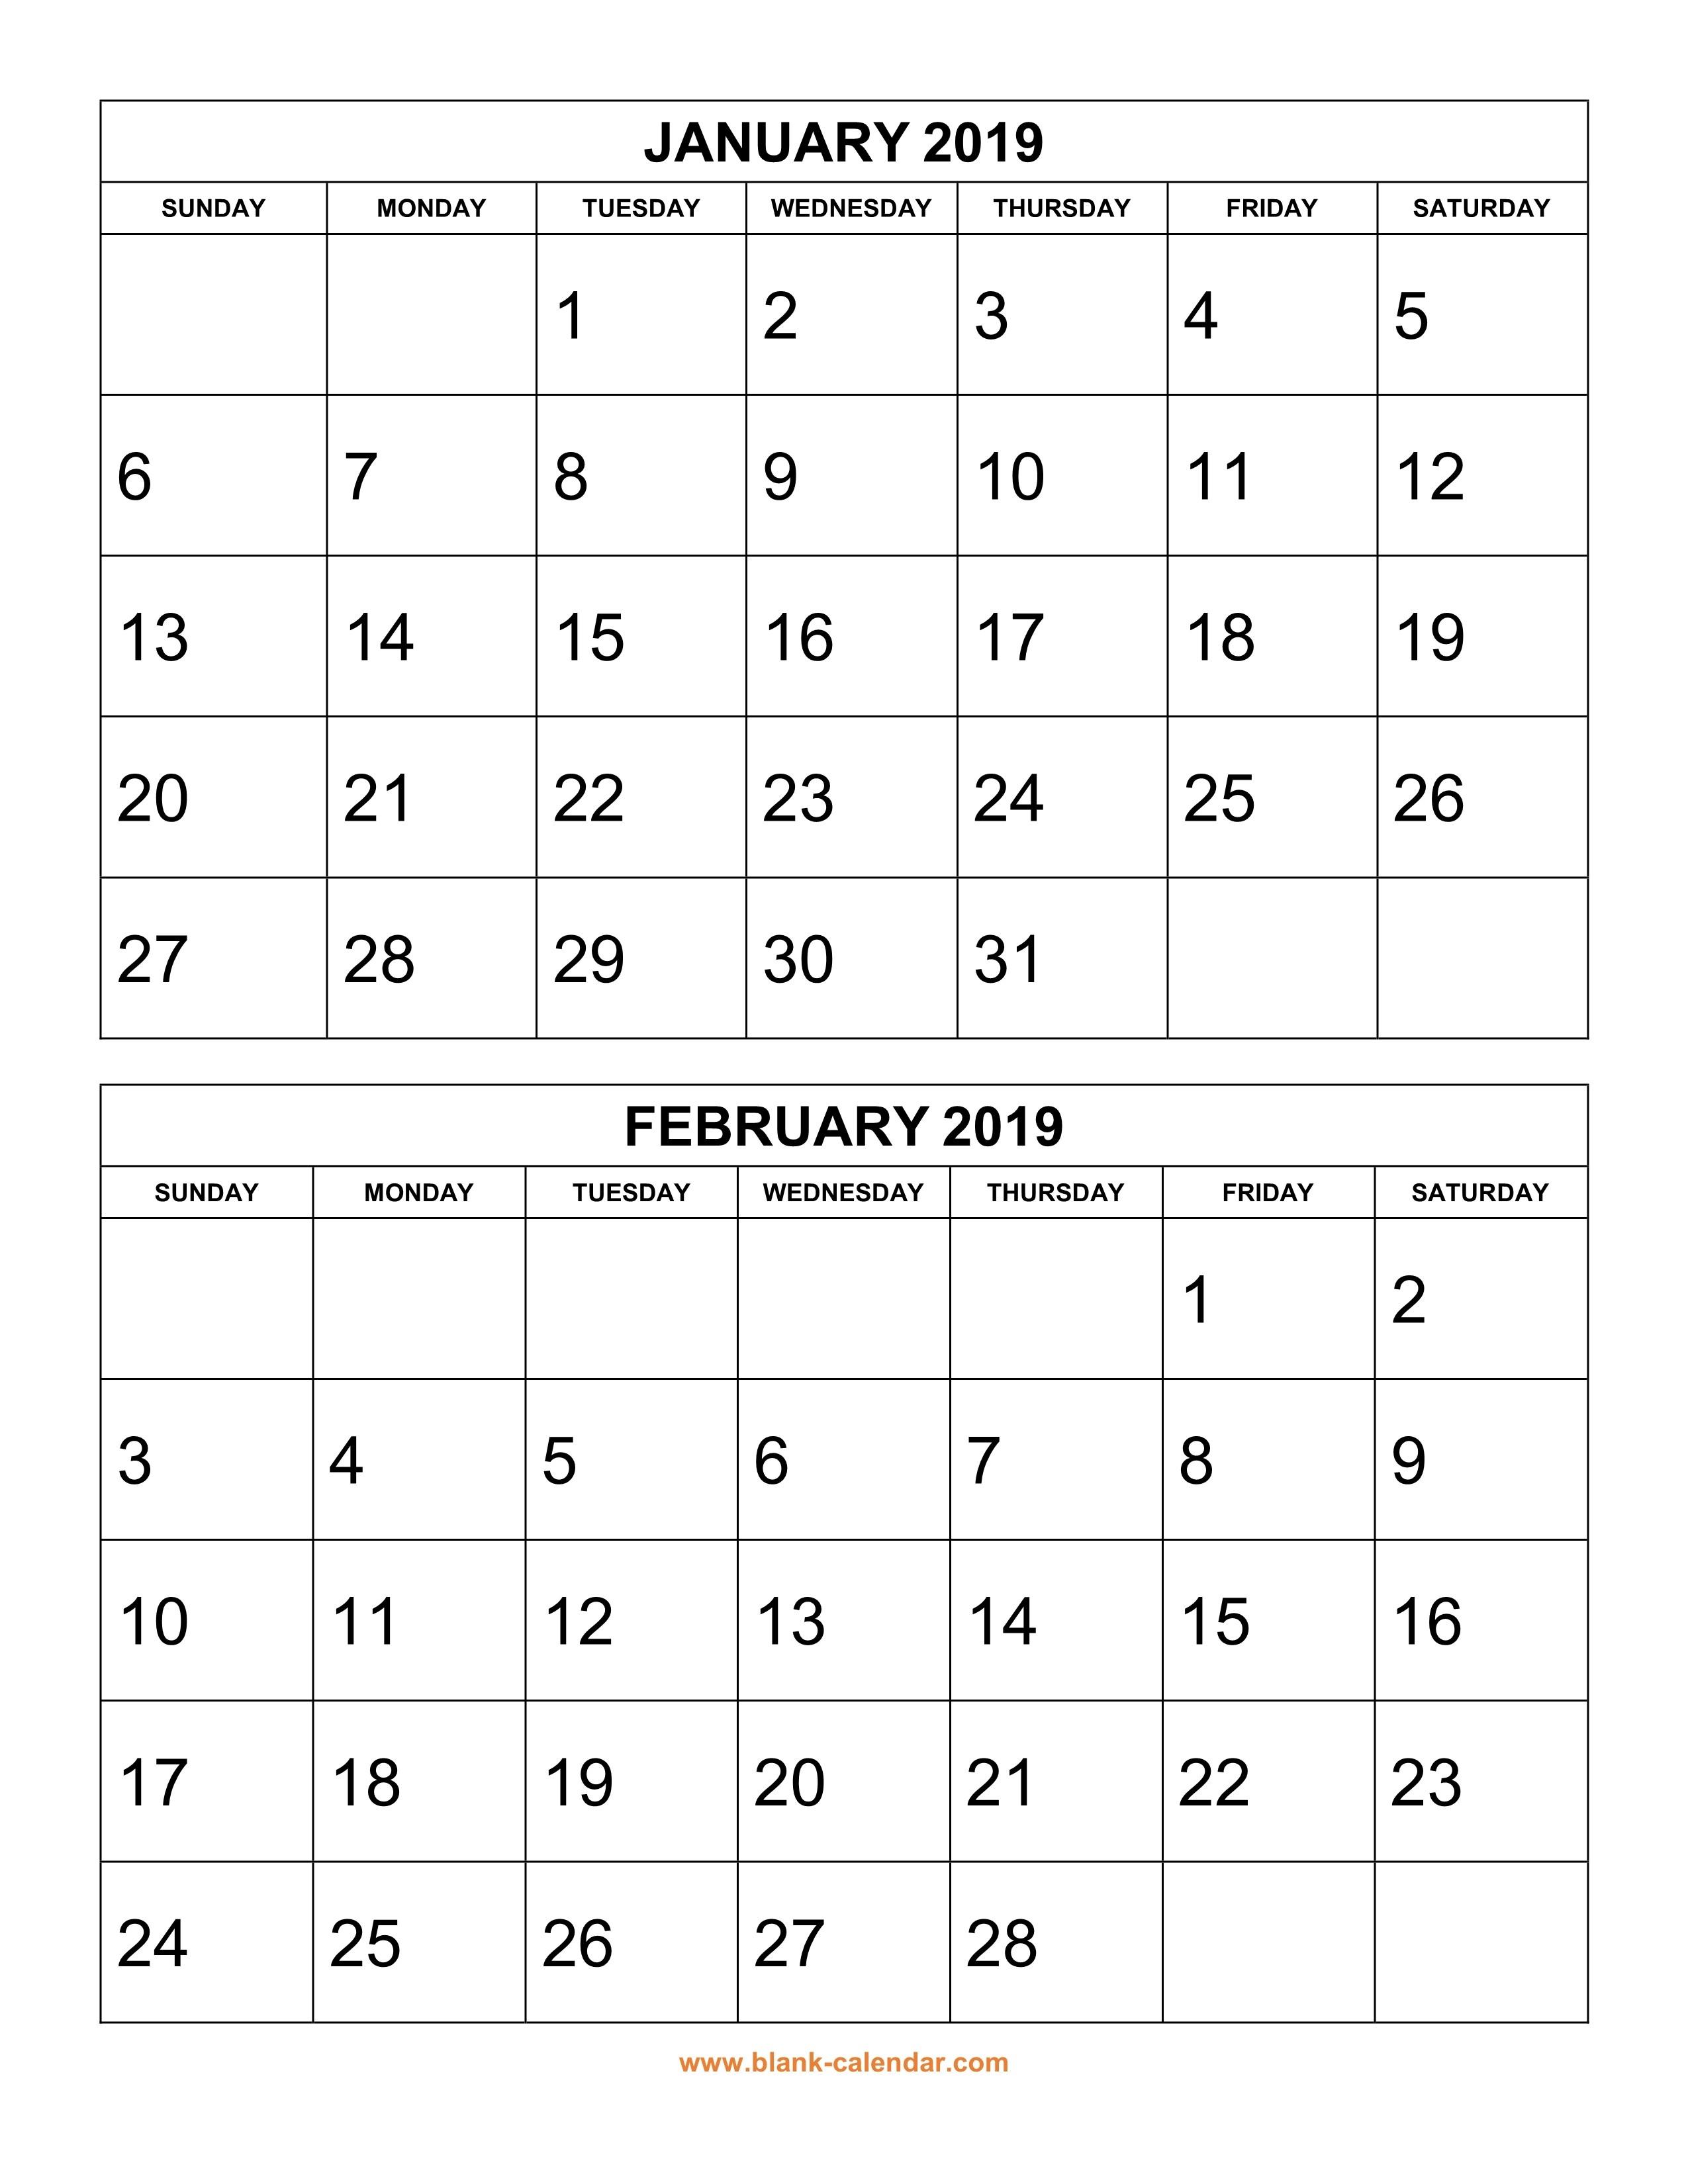 Printable Calendar 2019 2 Months Per Page | Printable-Blank Calendar Printable 4 Per Page